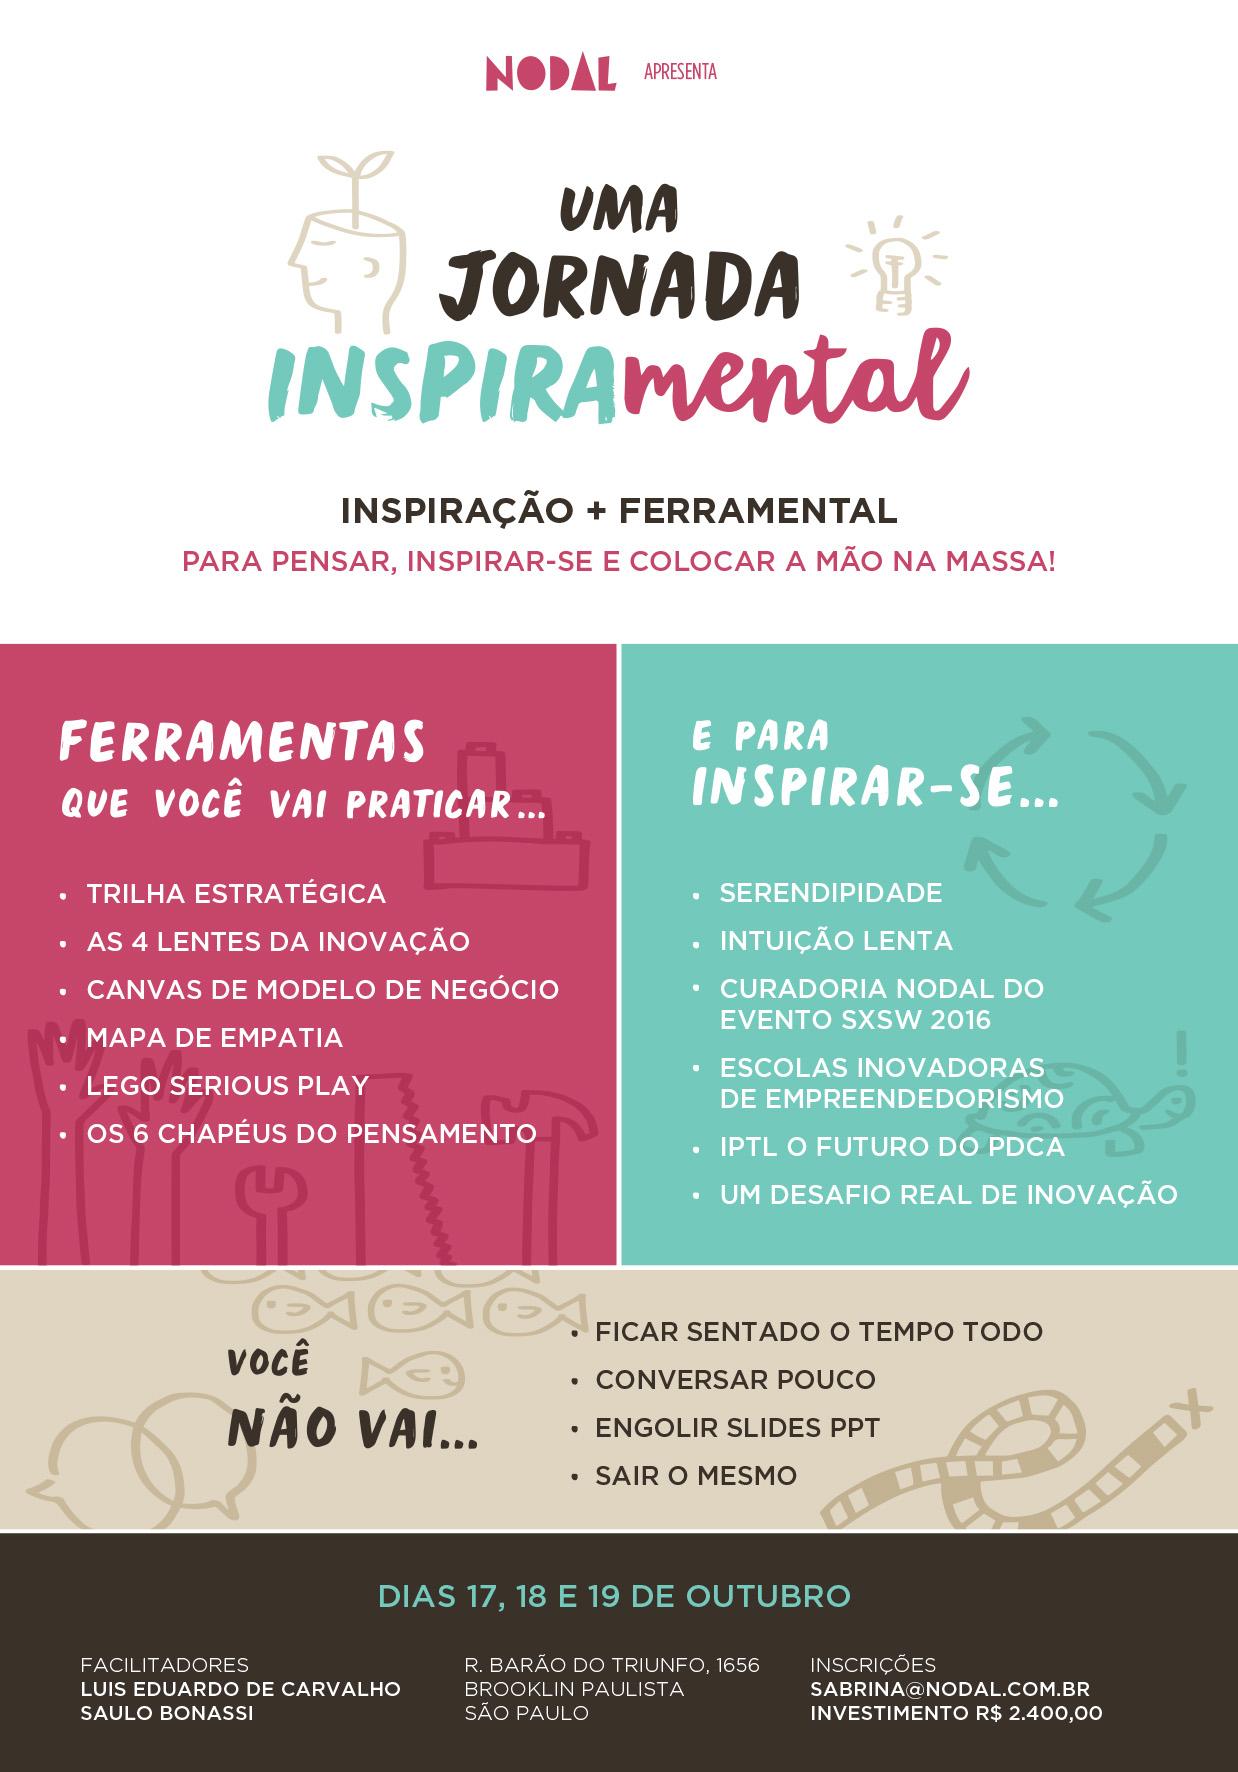 NODAL APRESENTA - UMA JORNADA INSPIRAMENTAL